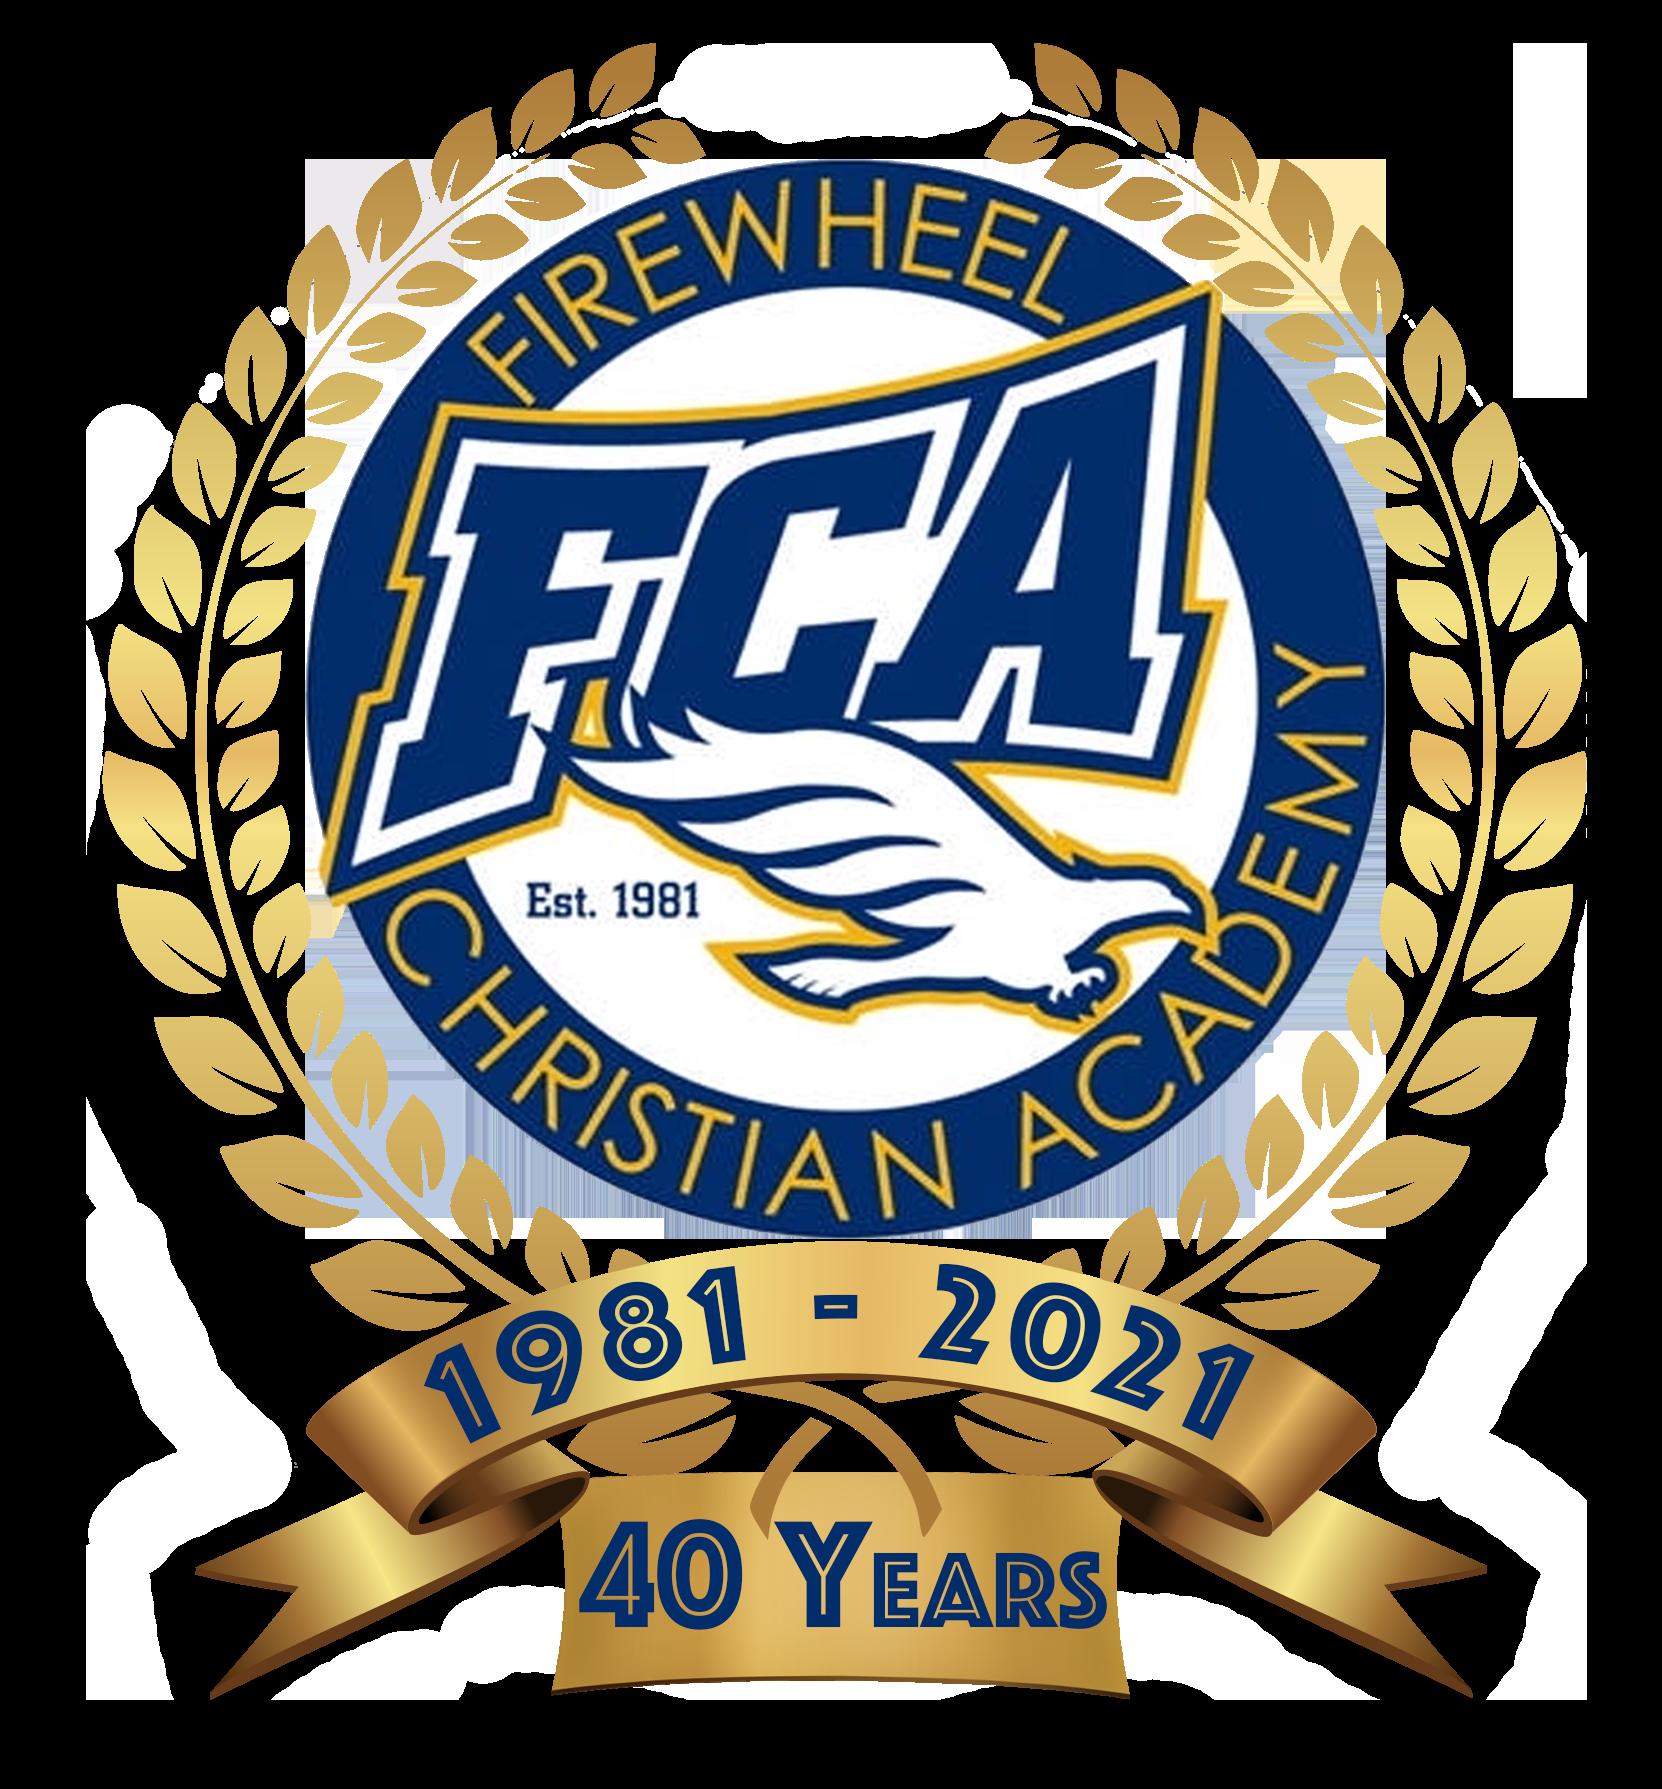 Firewheel Christian Academy